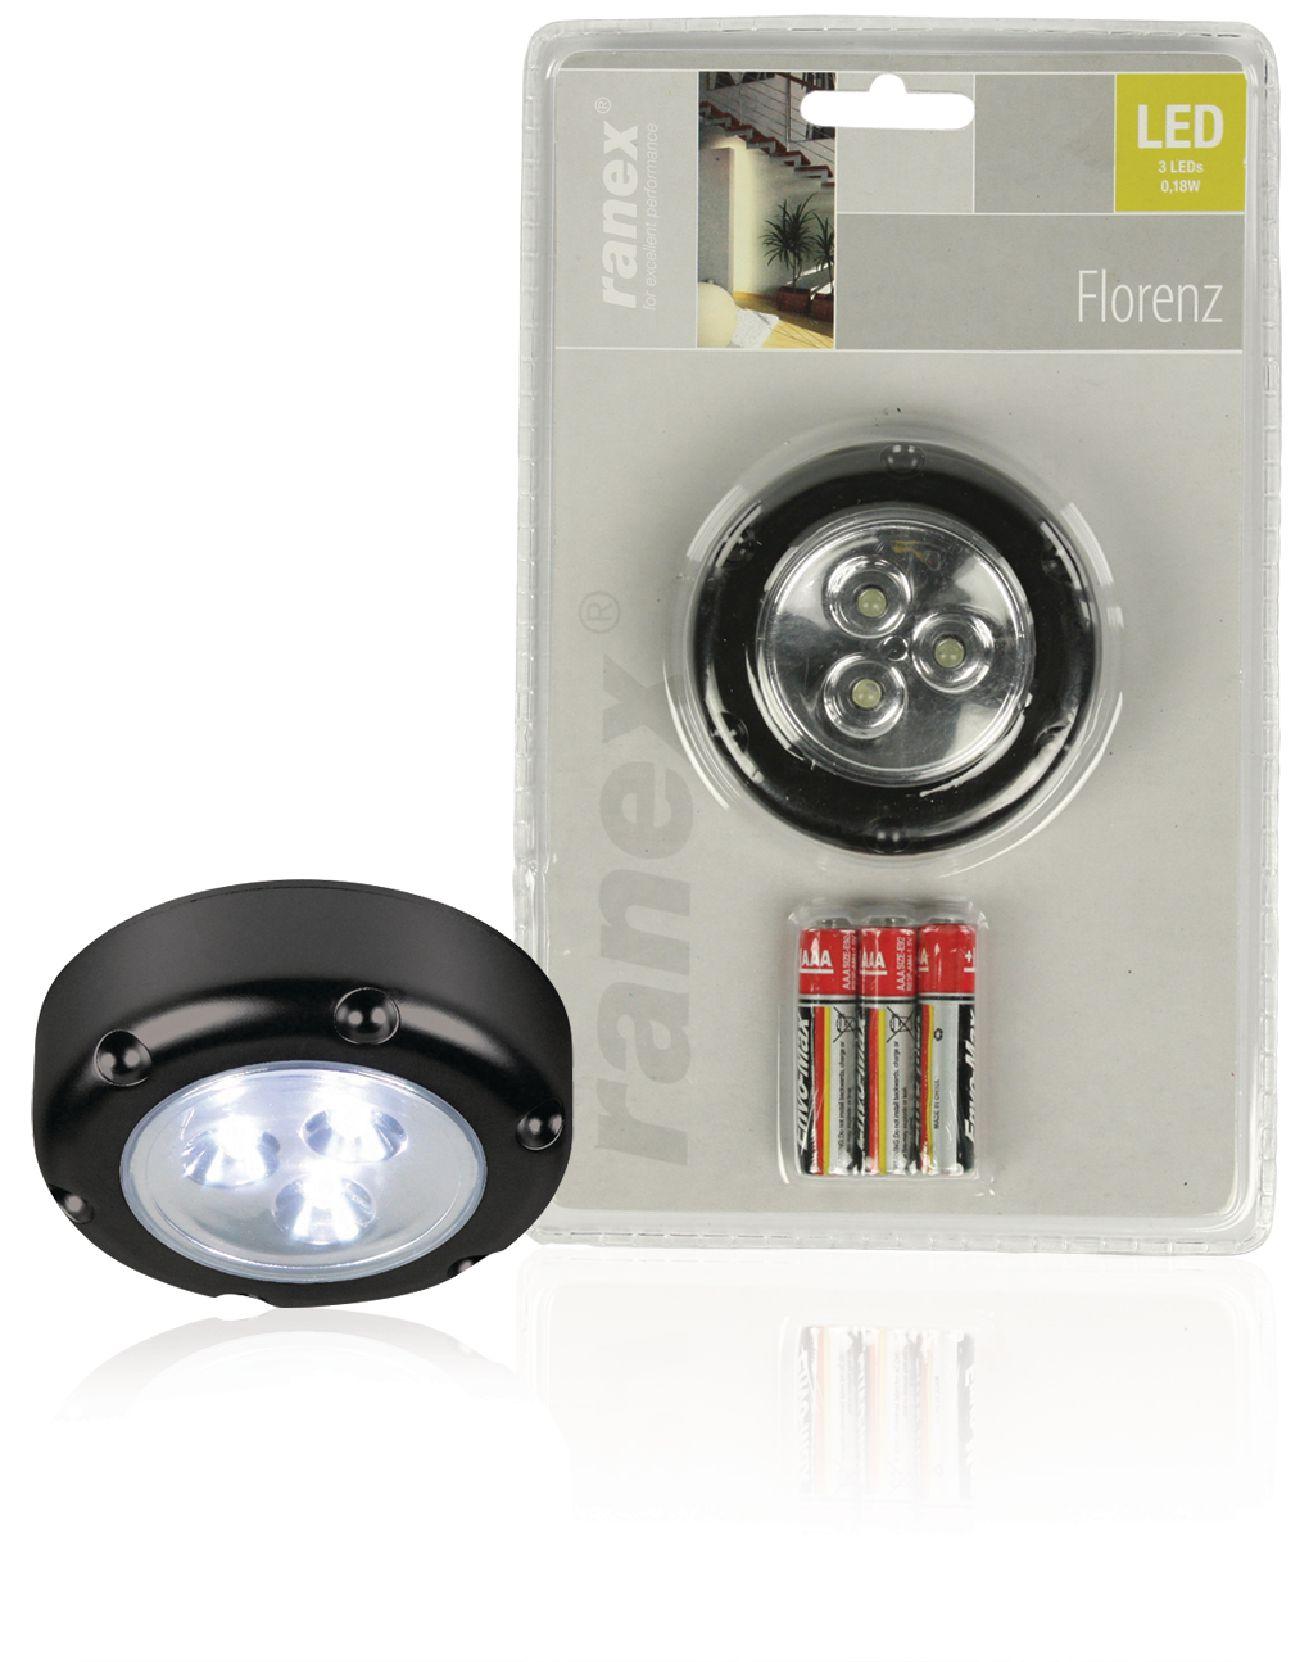 LED dotykové bateriové svítidlo Florenz, černé Ranex RA-6000076